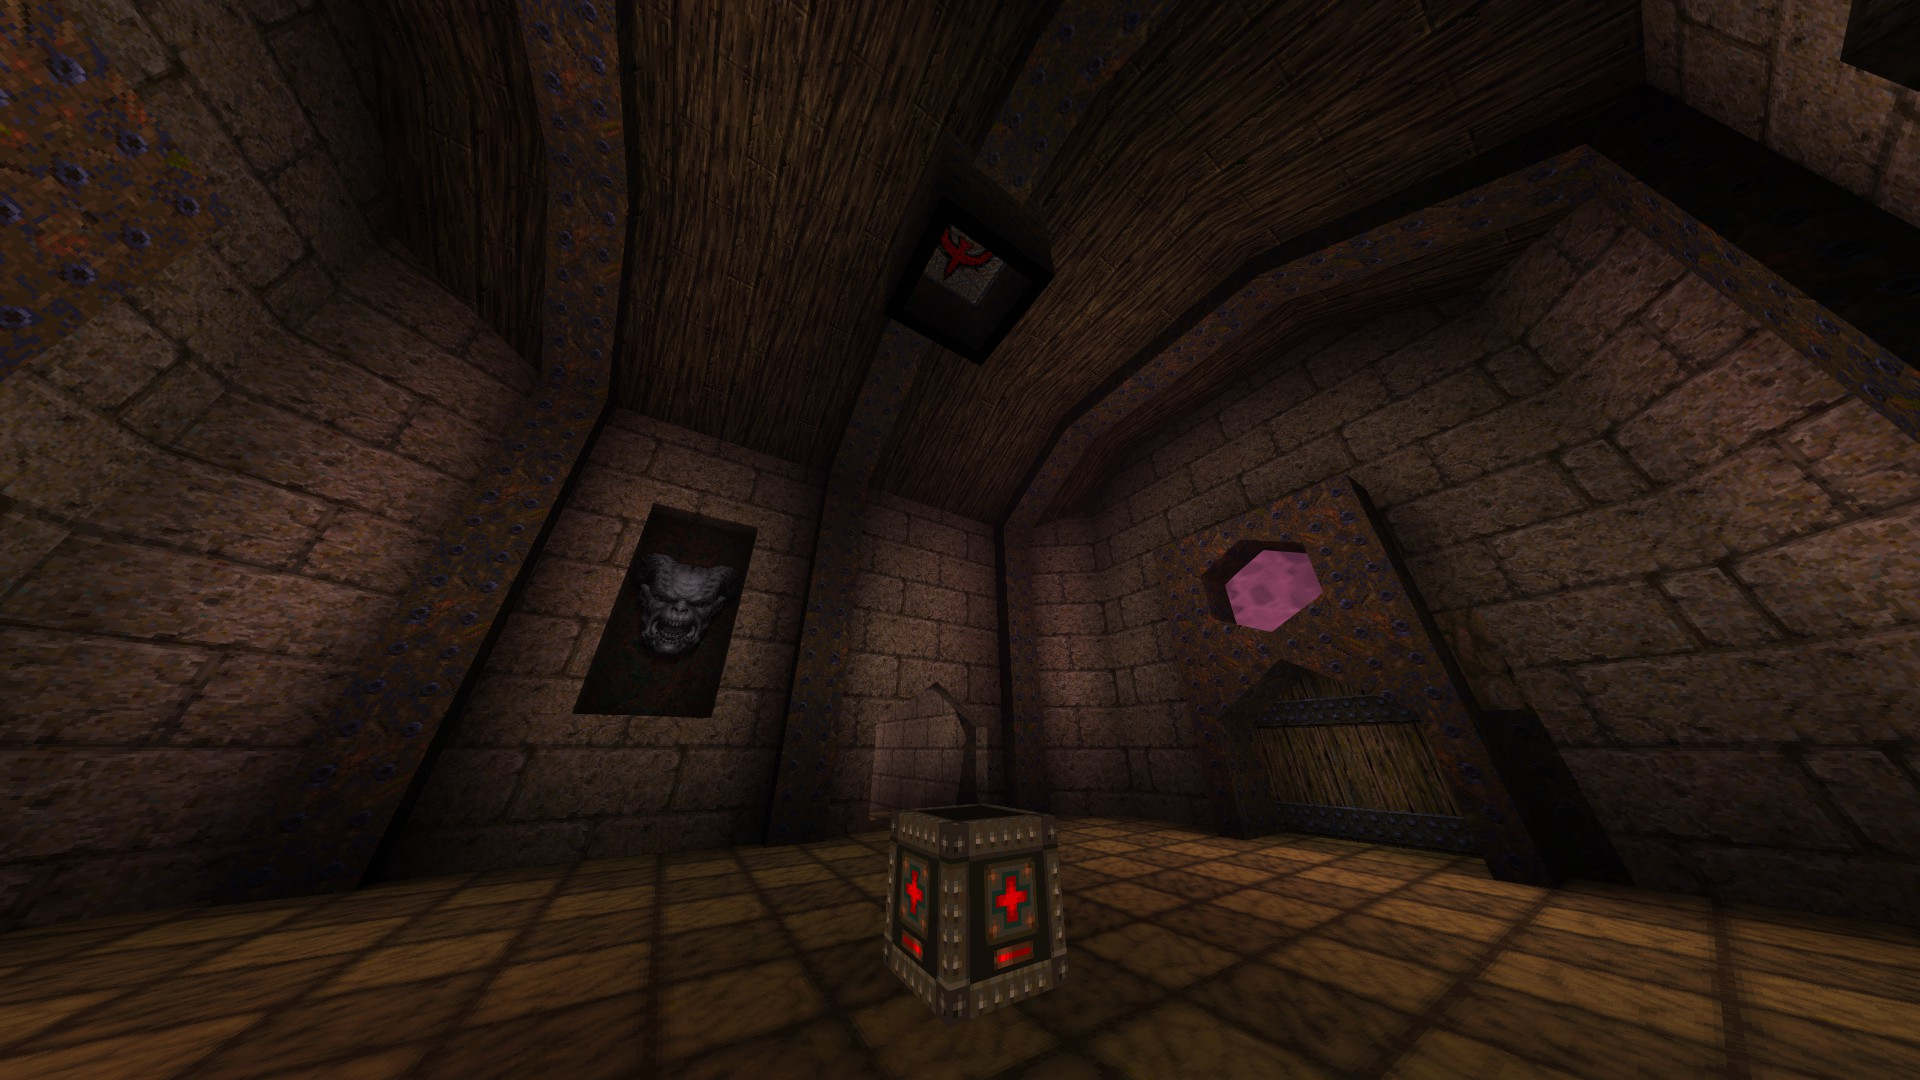 Quake - Locations of All Secrets in Game Tips - E2: Dominion of Darkness - Part I - E5A5966